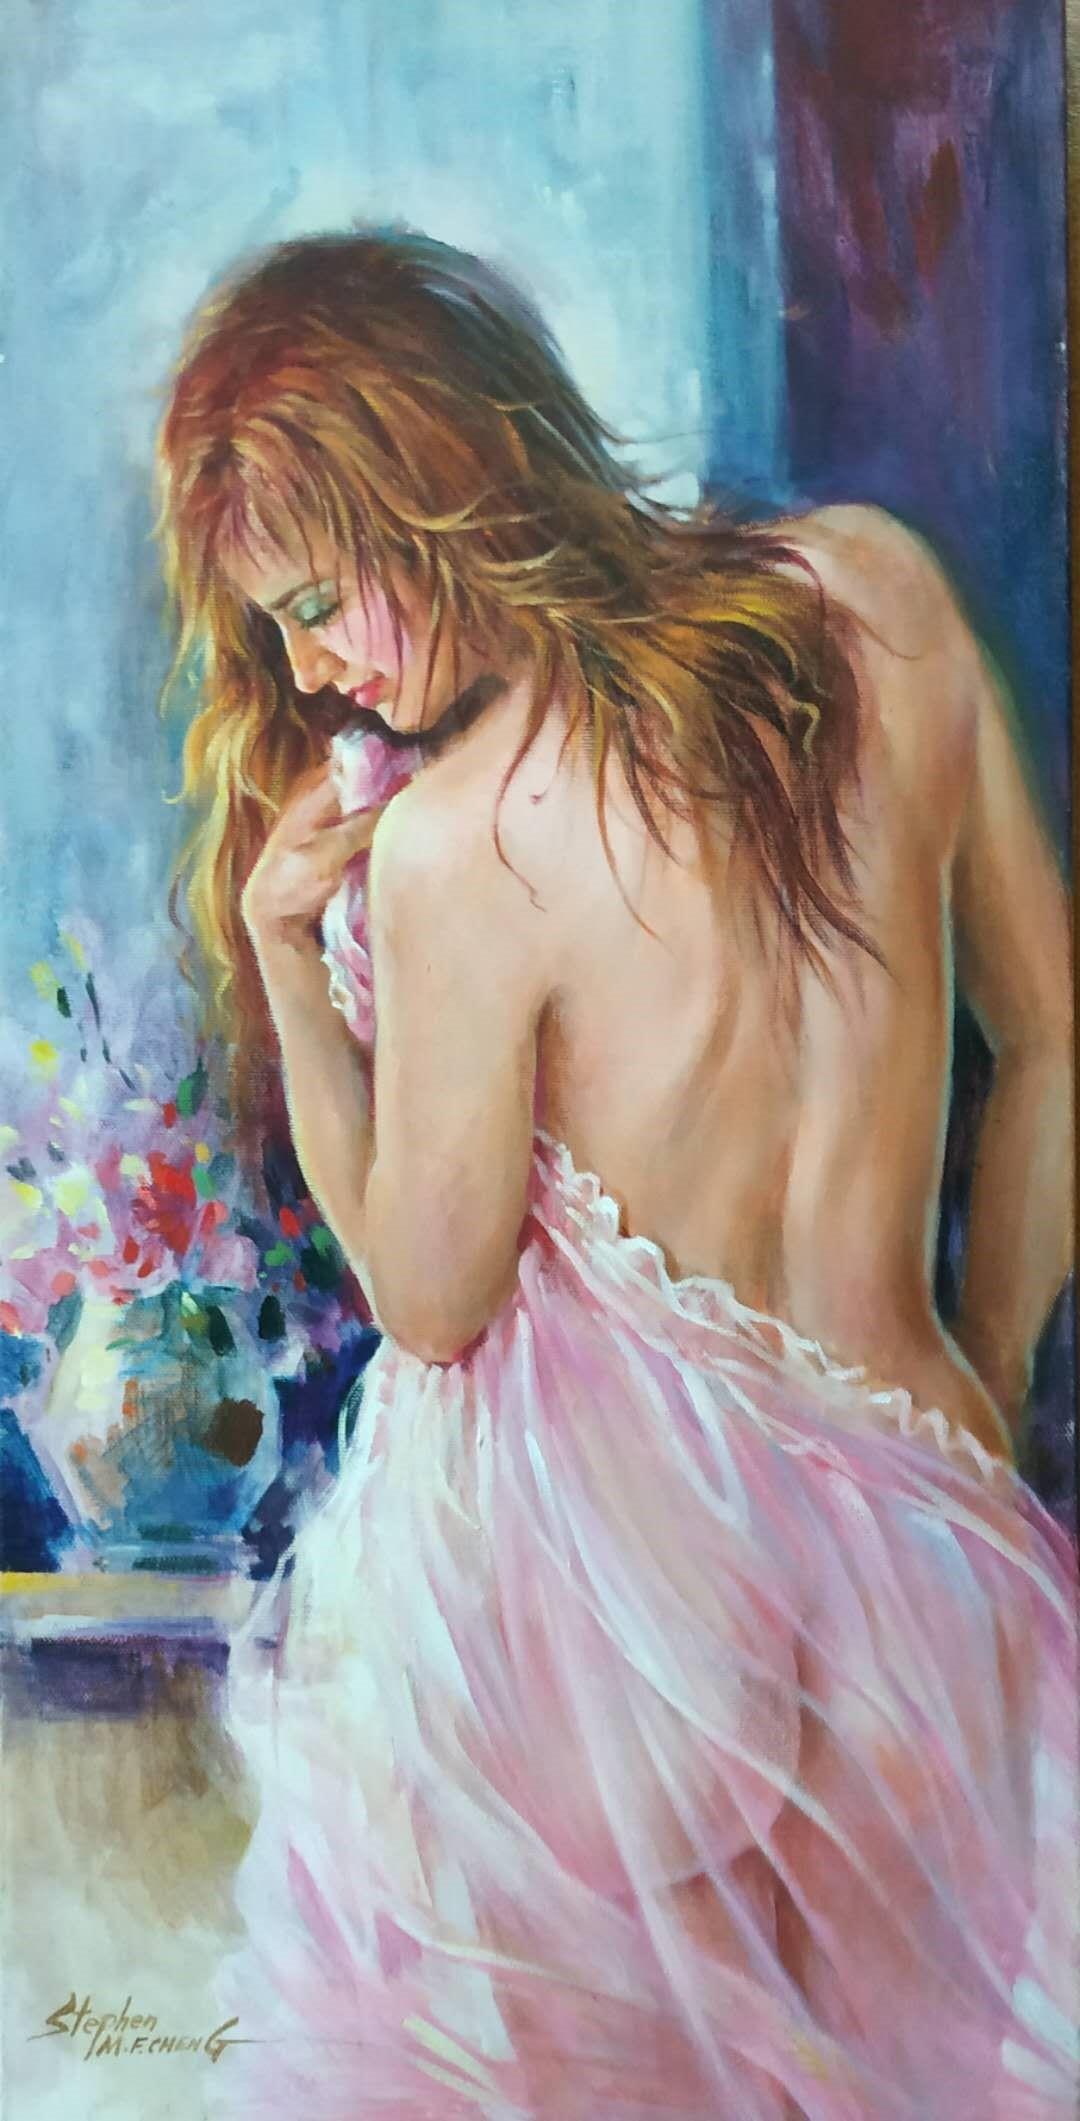 Stephen Cheng-Elegant Seduction-Original Acrylic-12x24